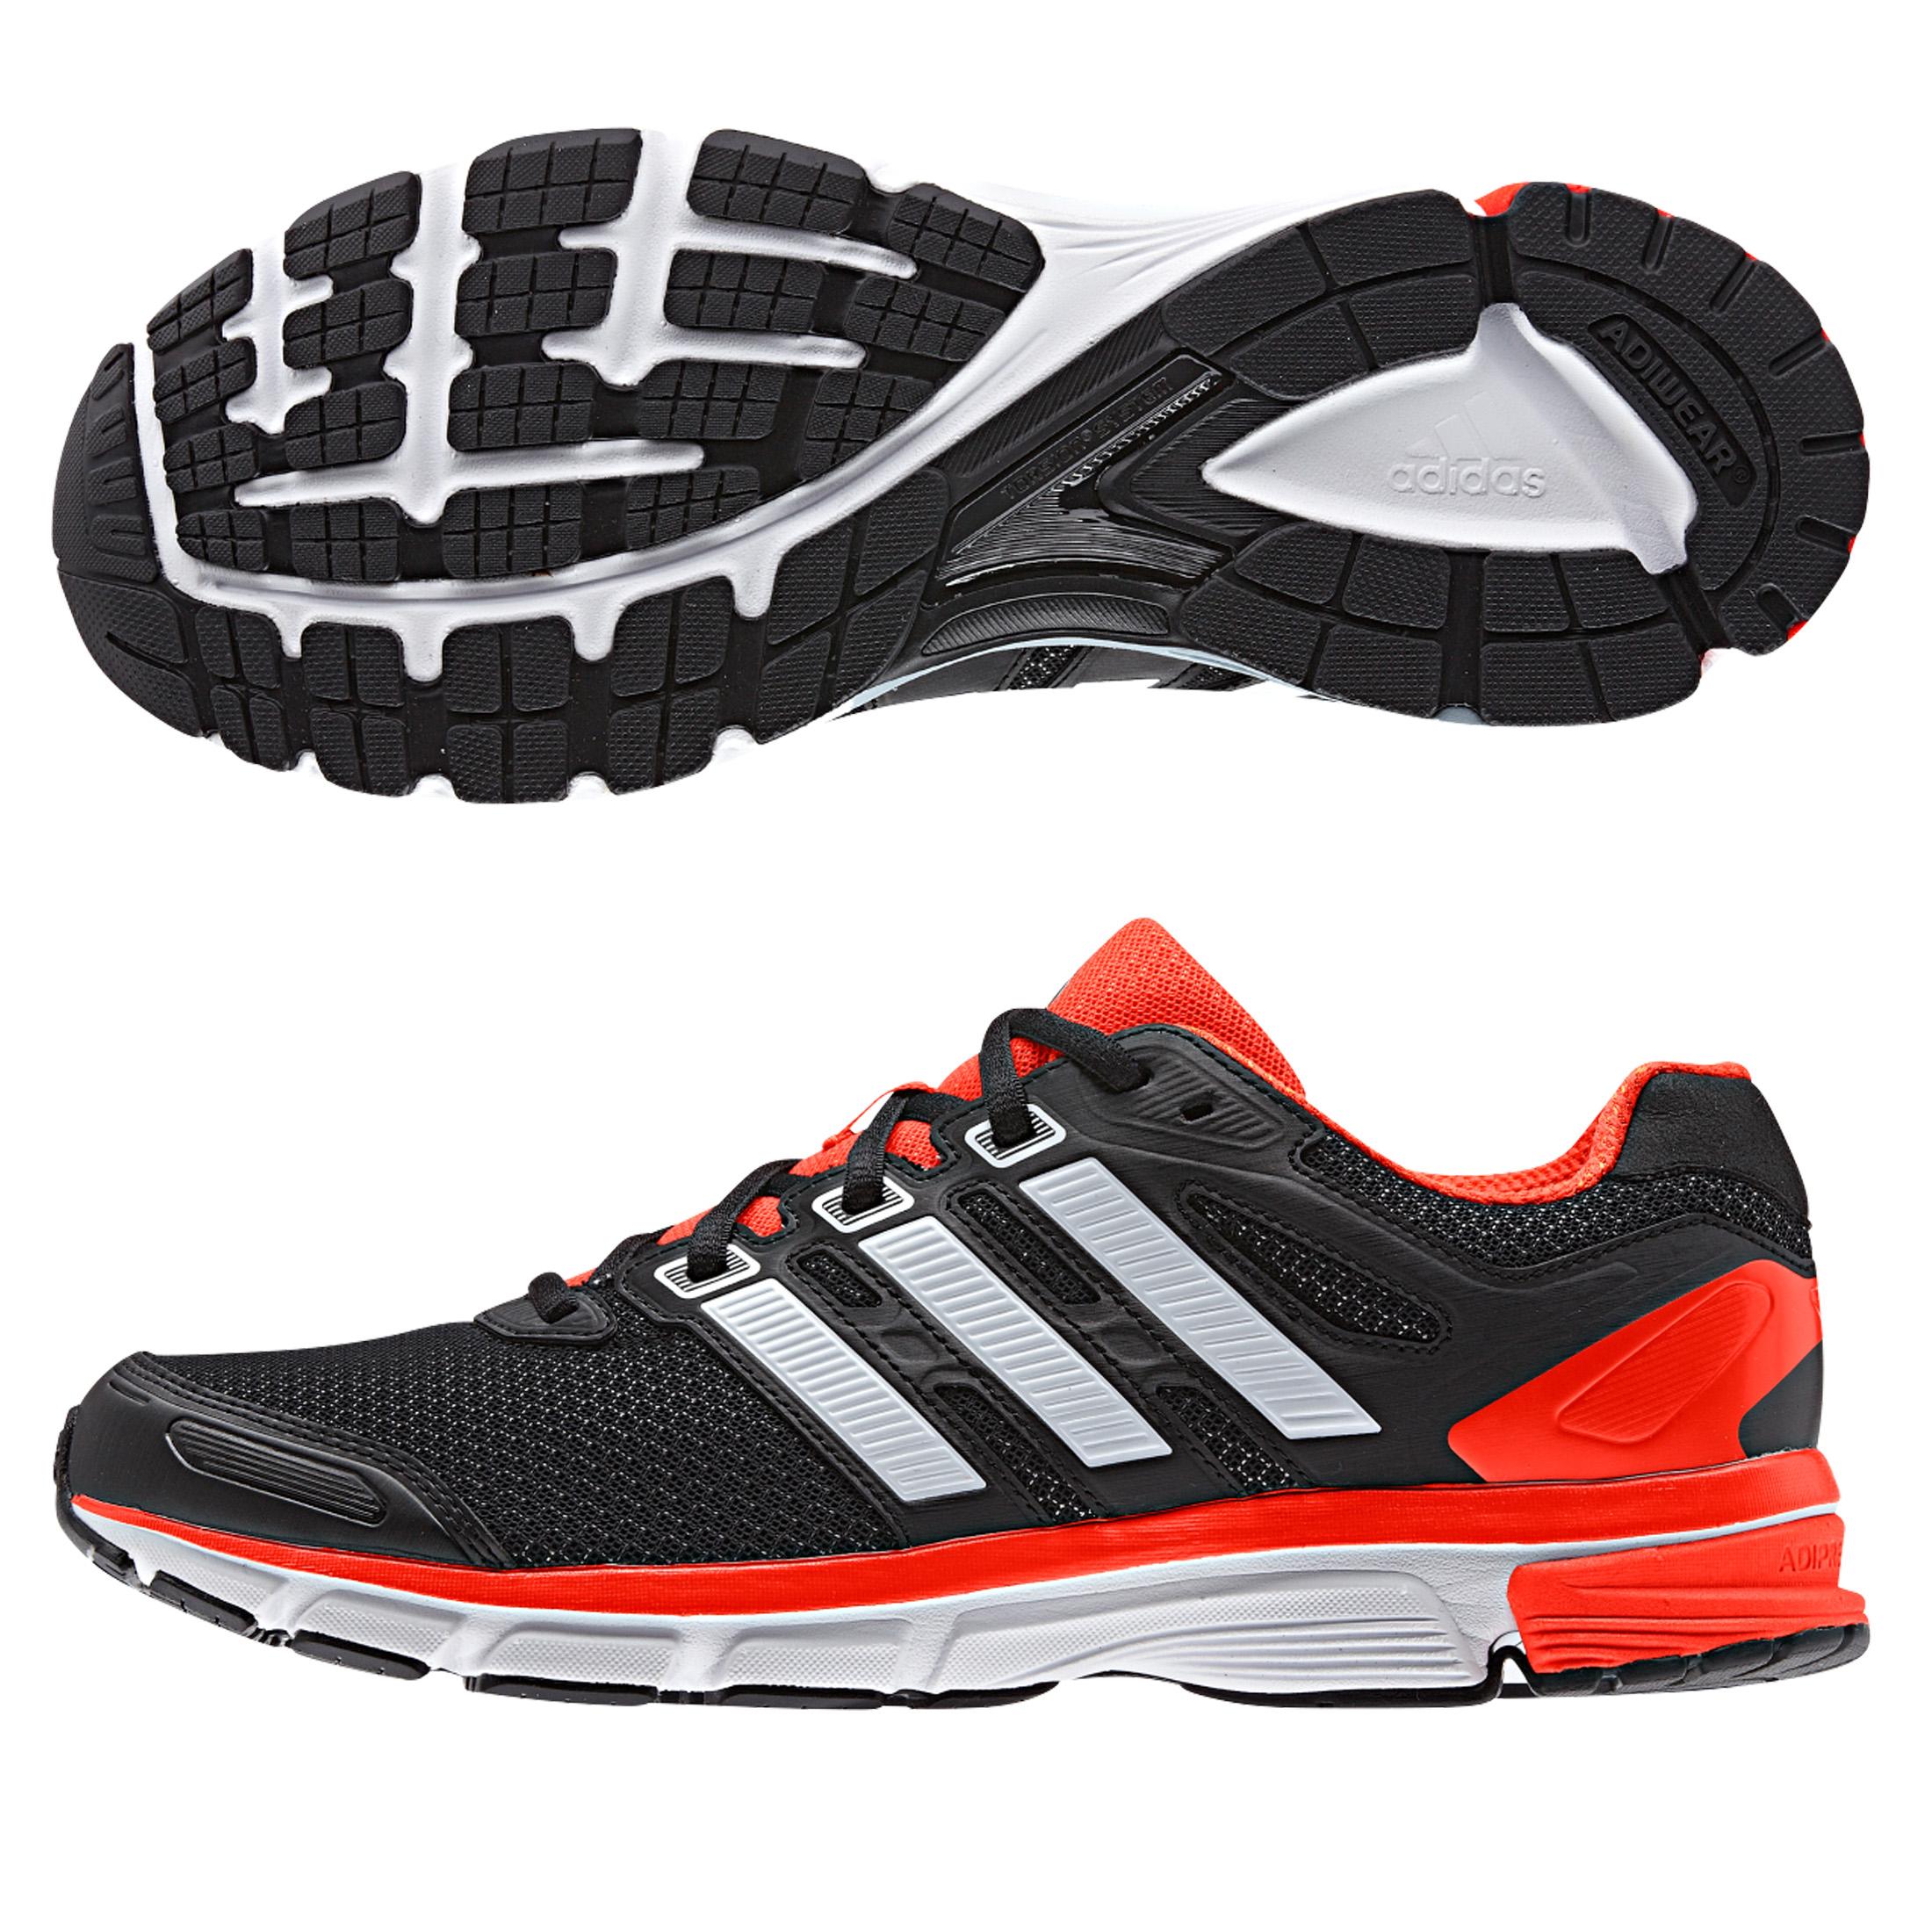 Adidas Nova Stability Trainers Black